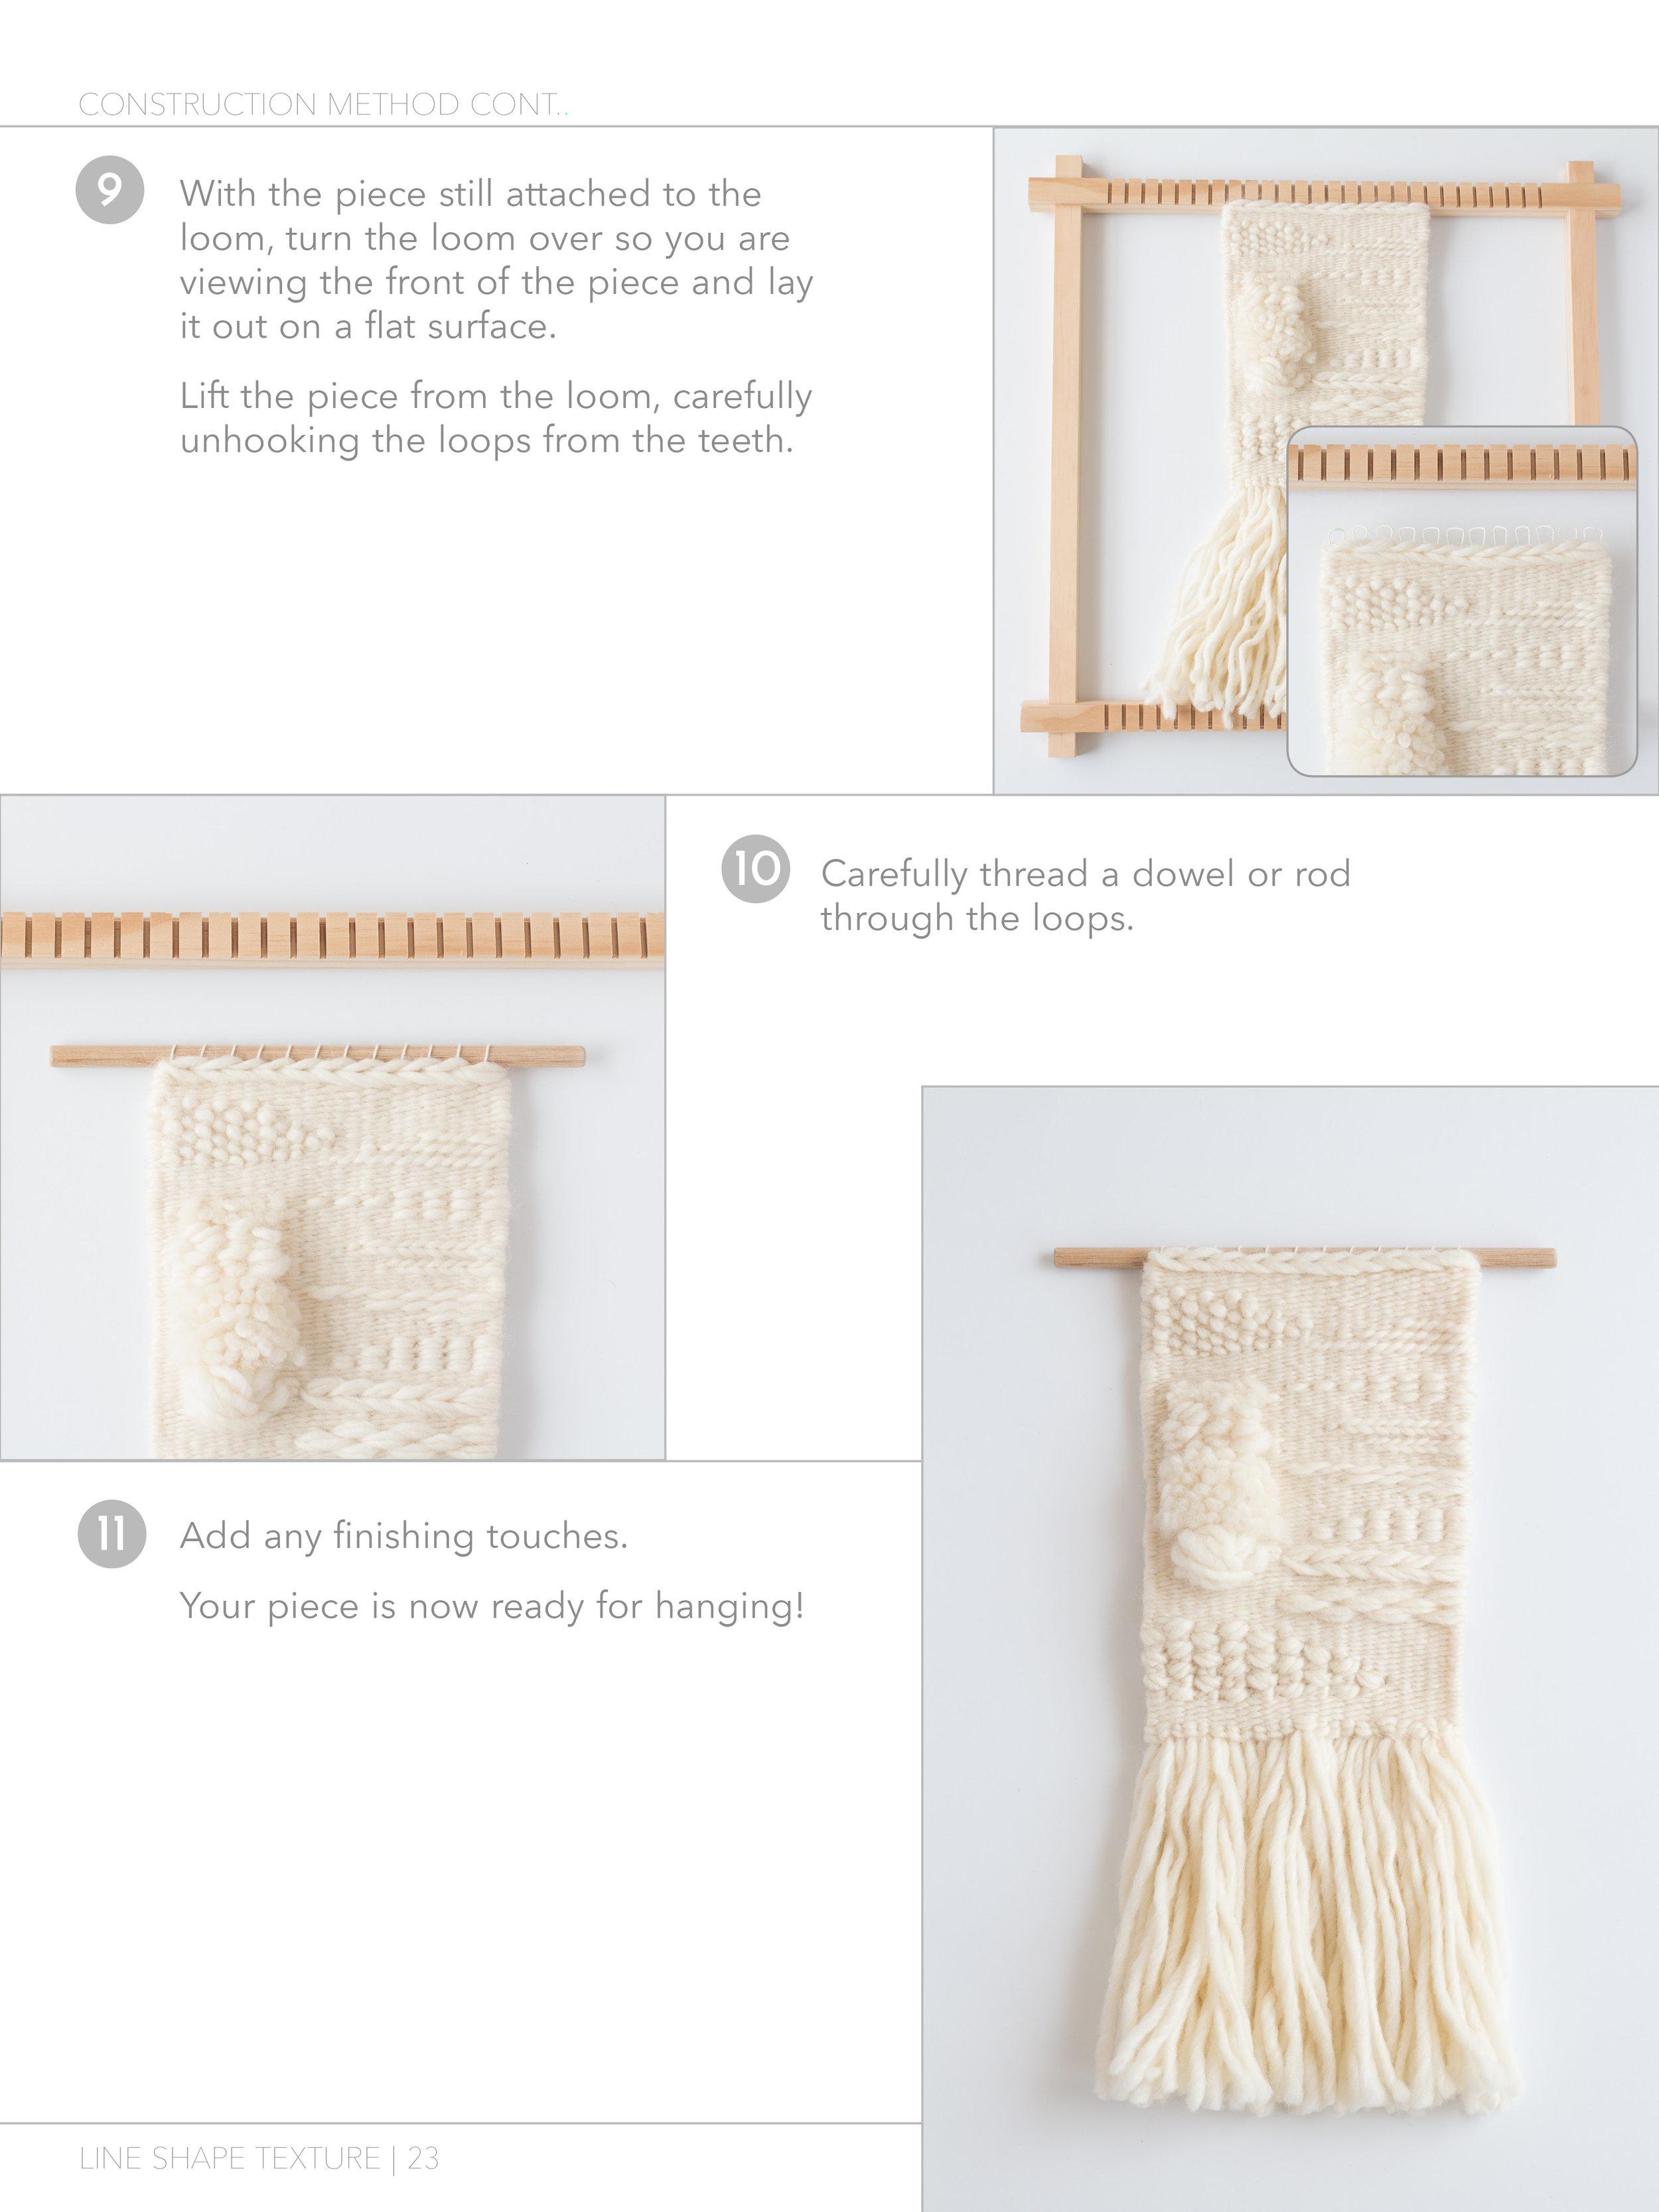 LINE SHAPE TEXTURE A Creative's Guide to Frame-Loom Weaving 6.jpg